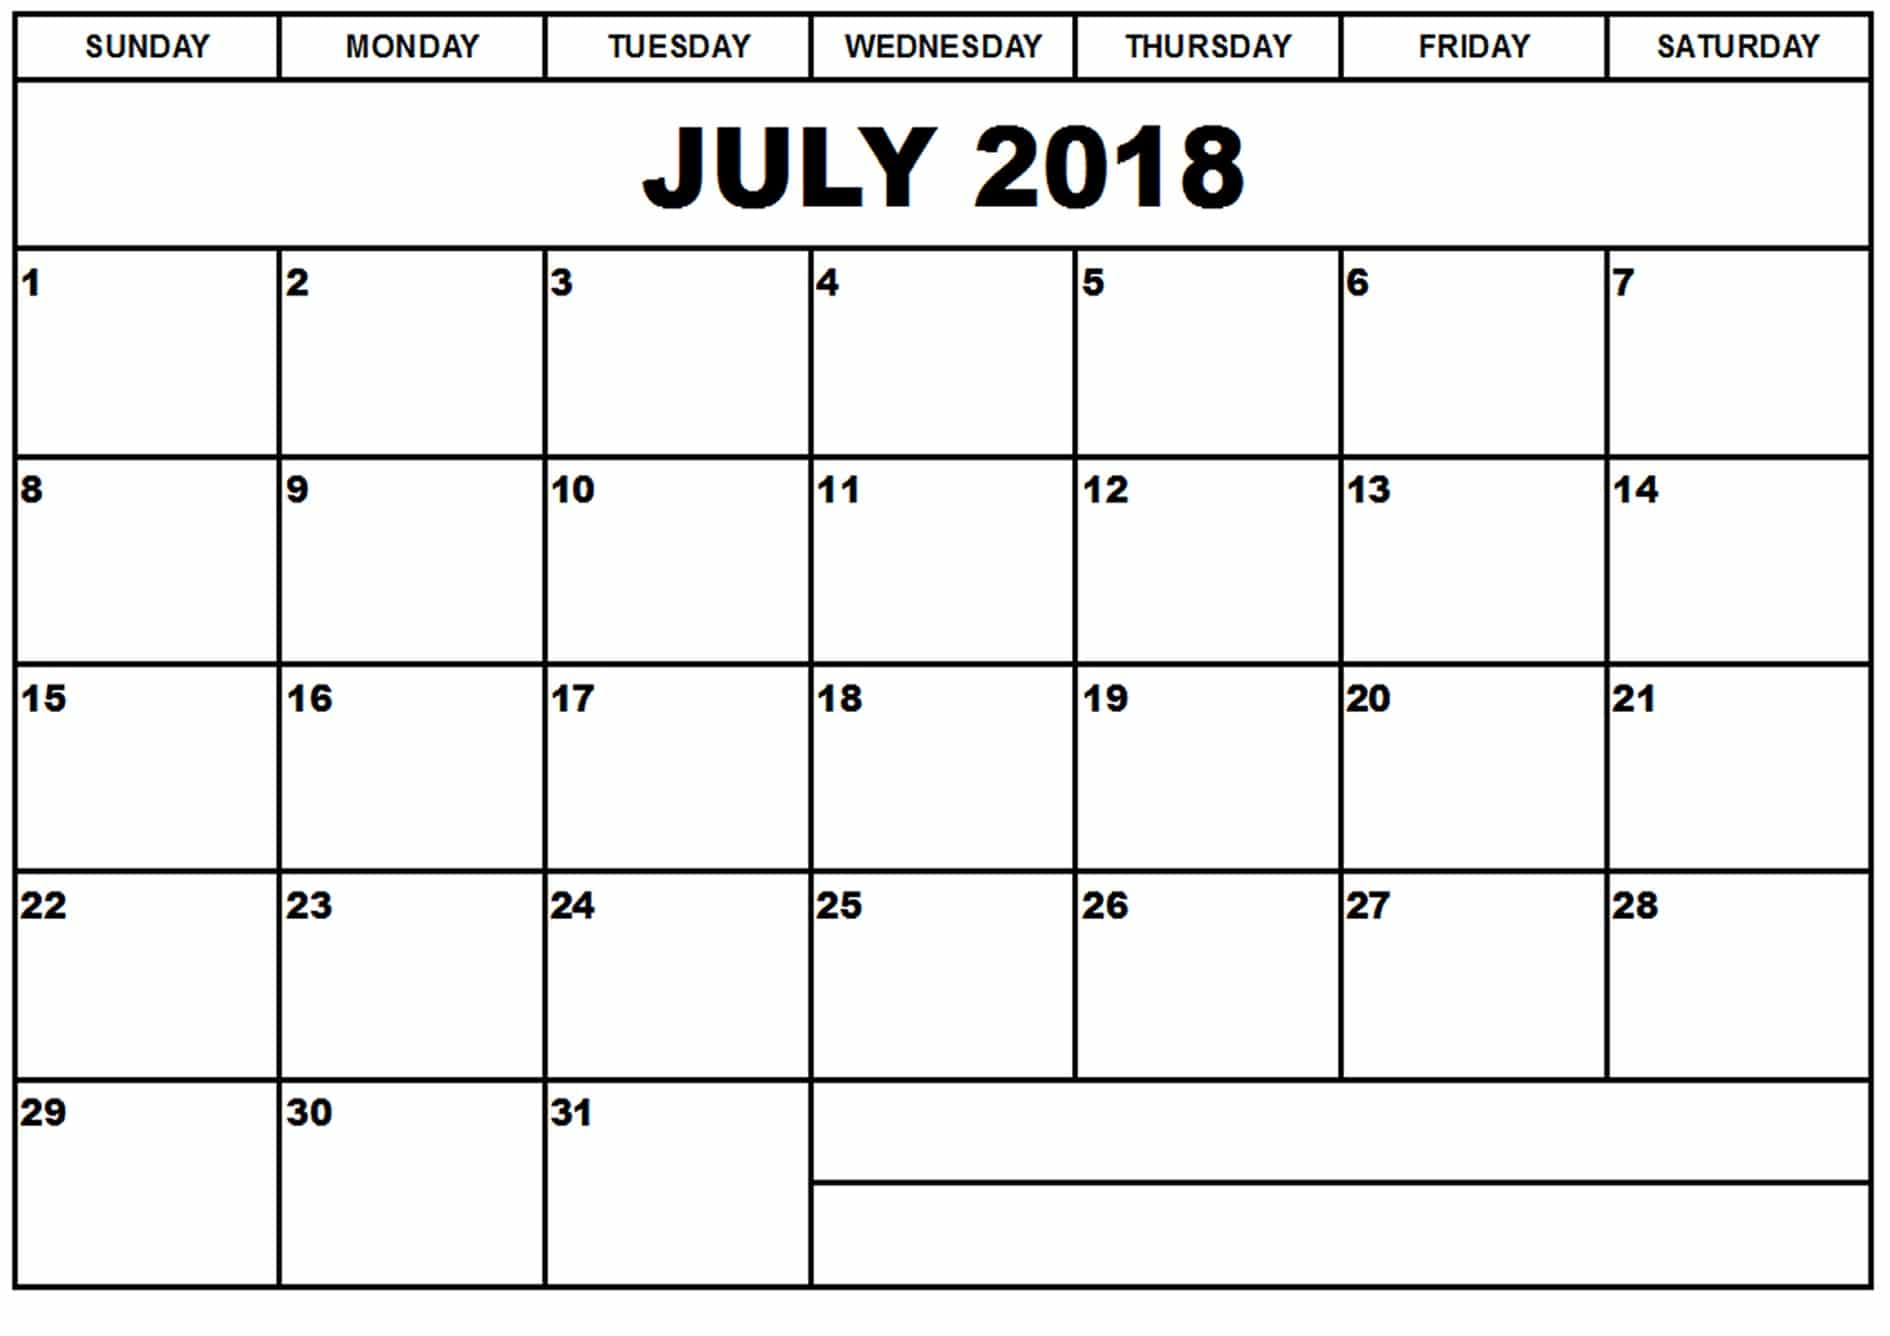 Print July 2018 Calendar